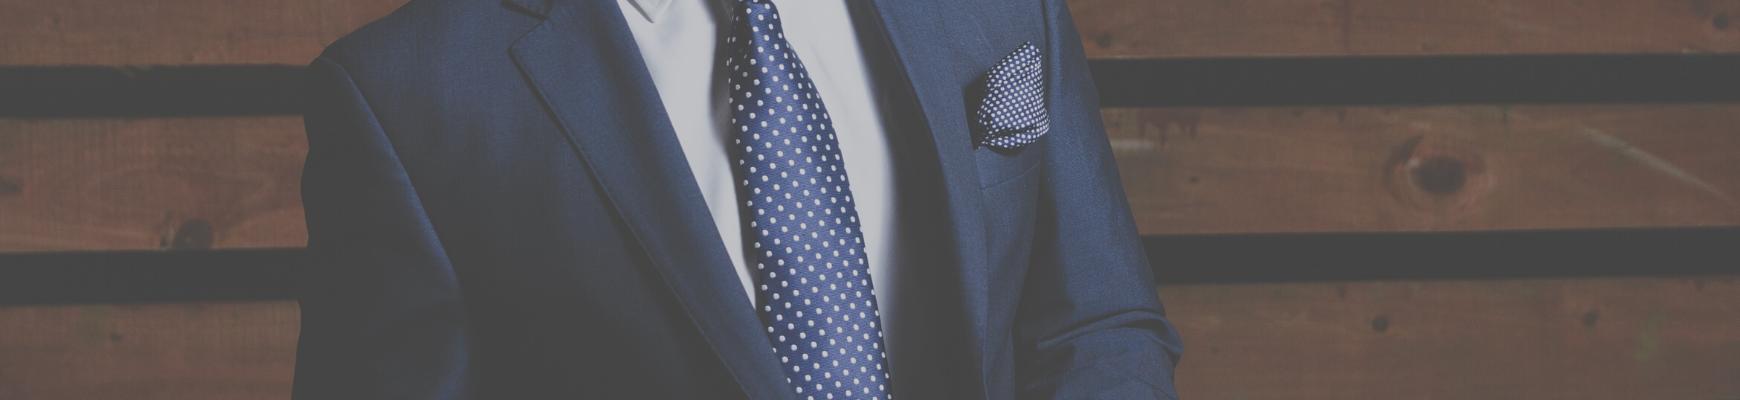 Suit Config Demo - Web Banner